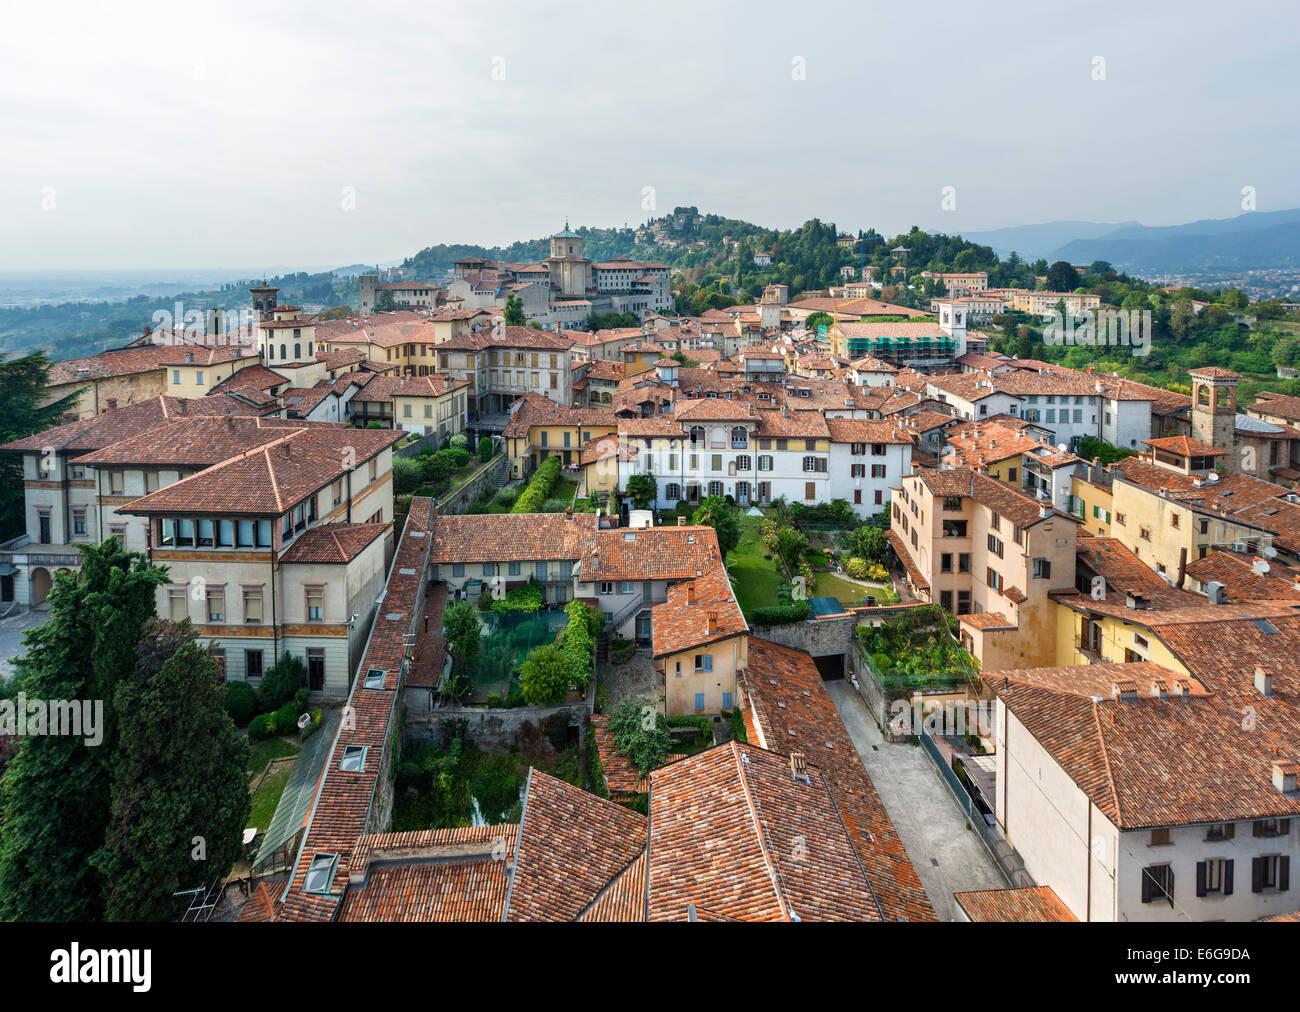 View from Torre Civica (Campanone), Bergamo Alta, Lombardy, Italy Stock Photo